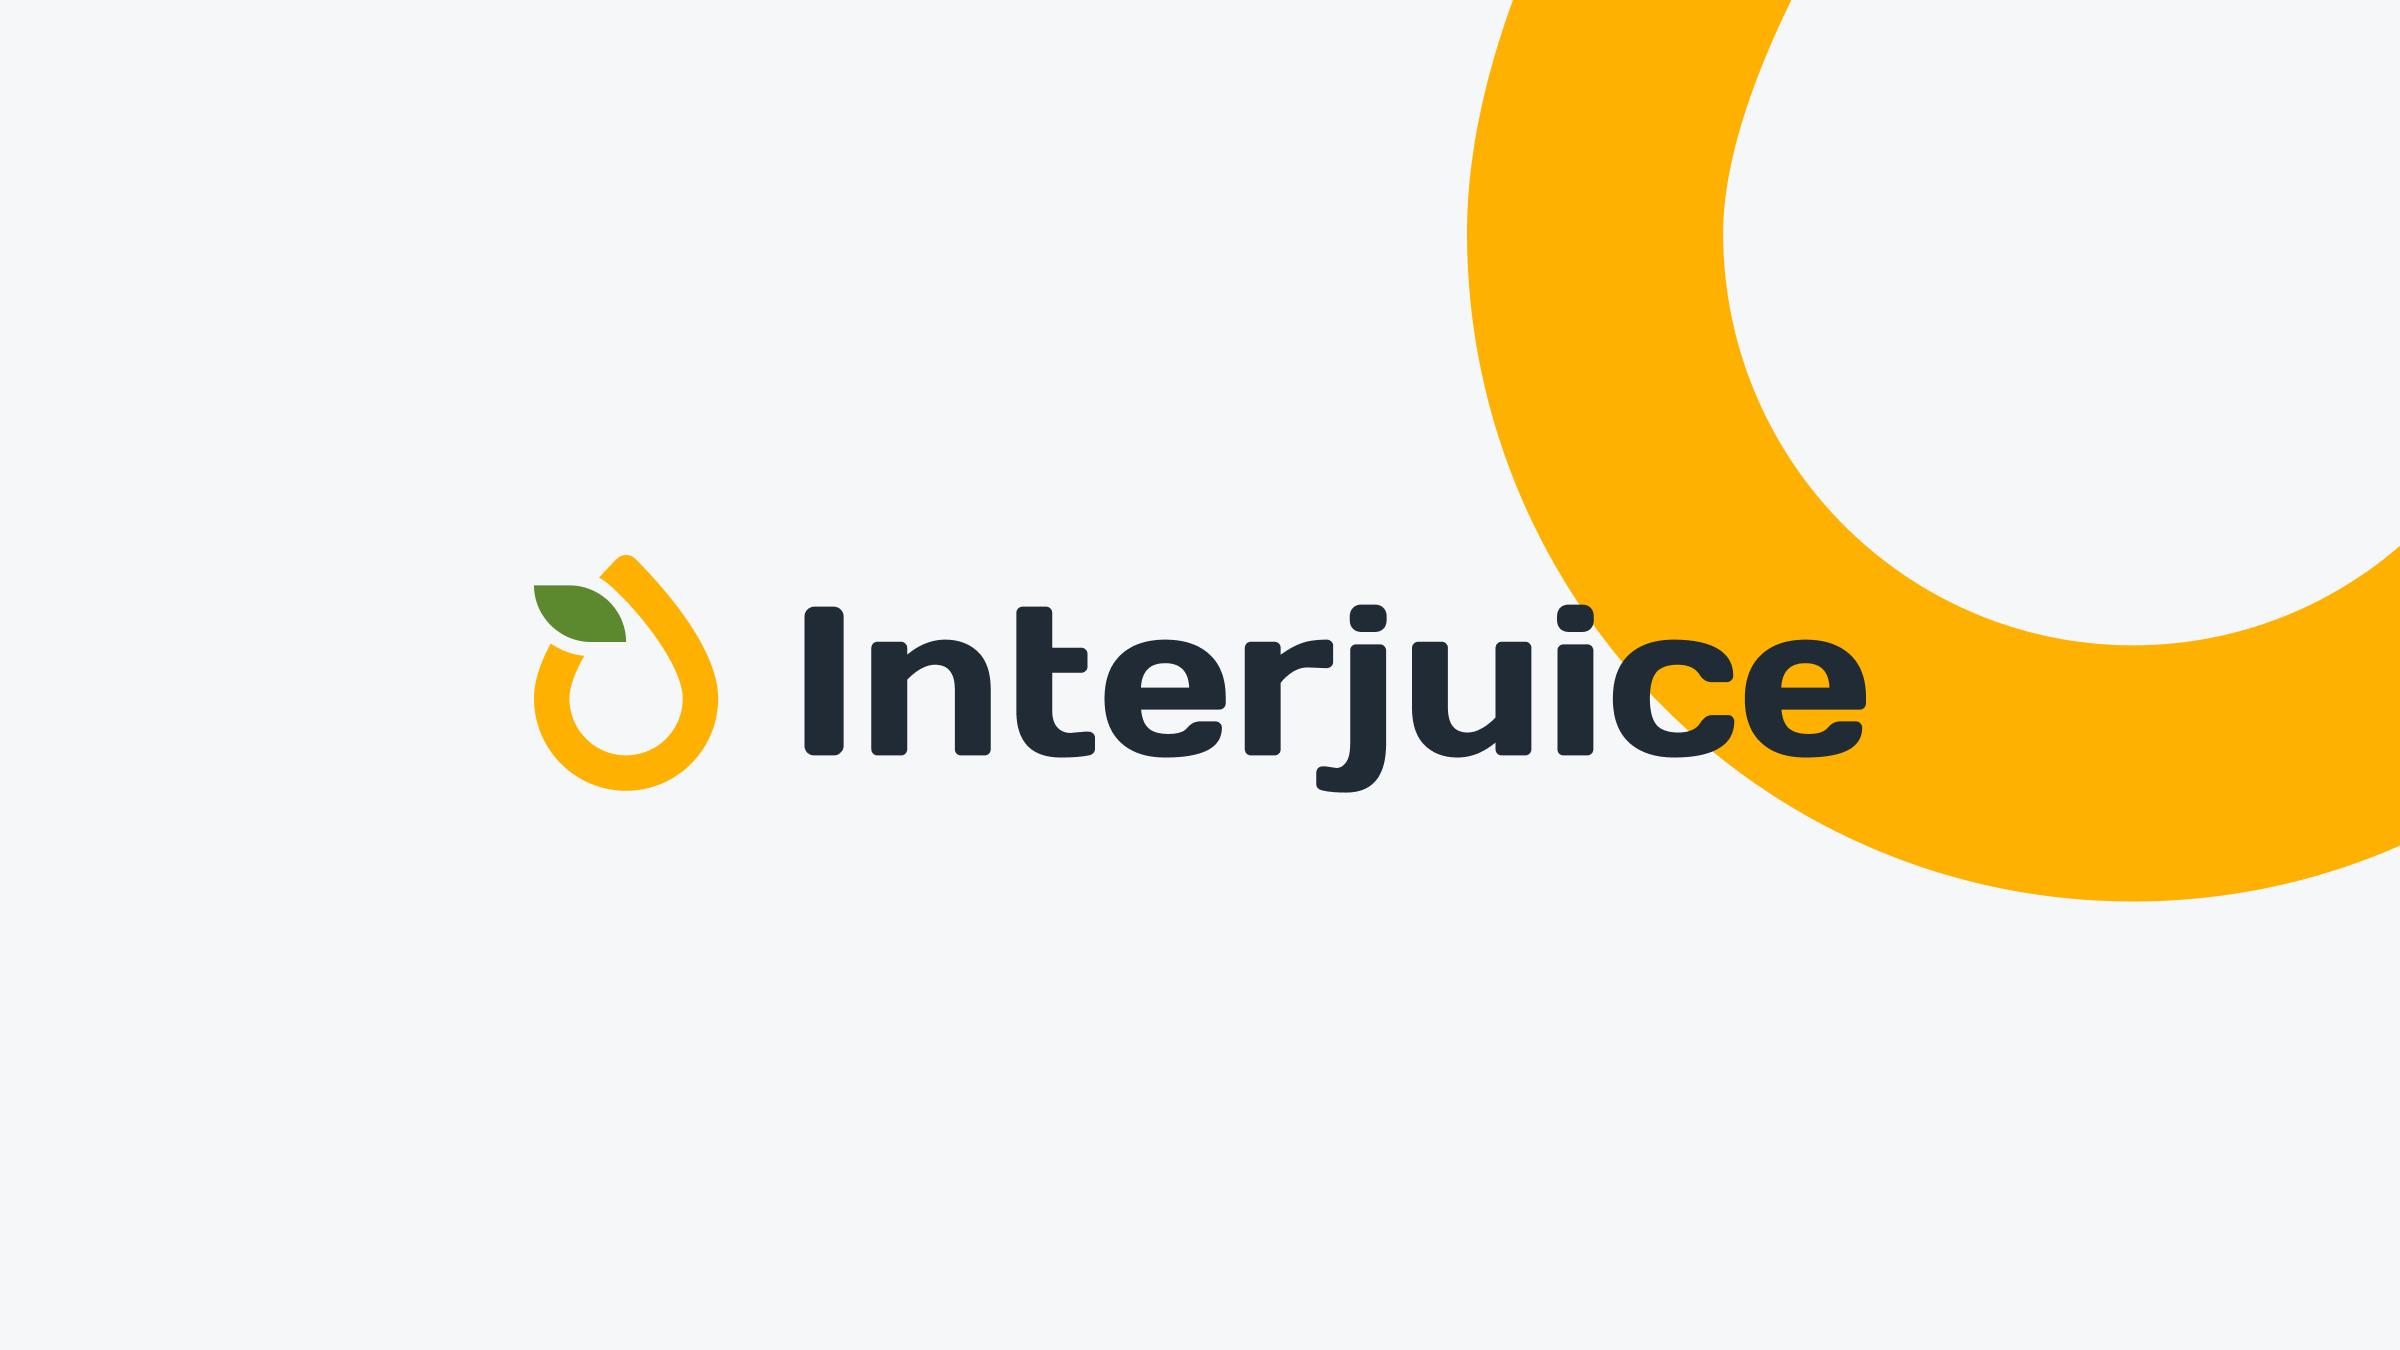 Interjuice_001